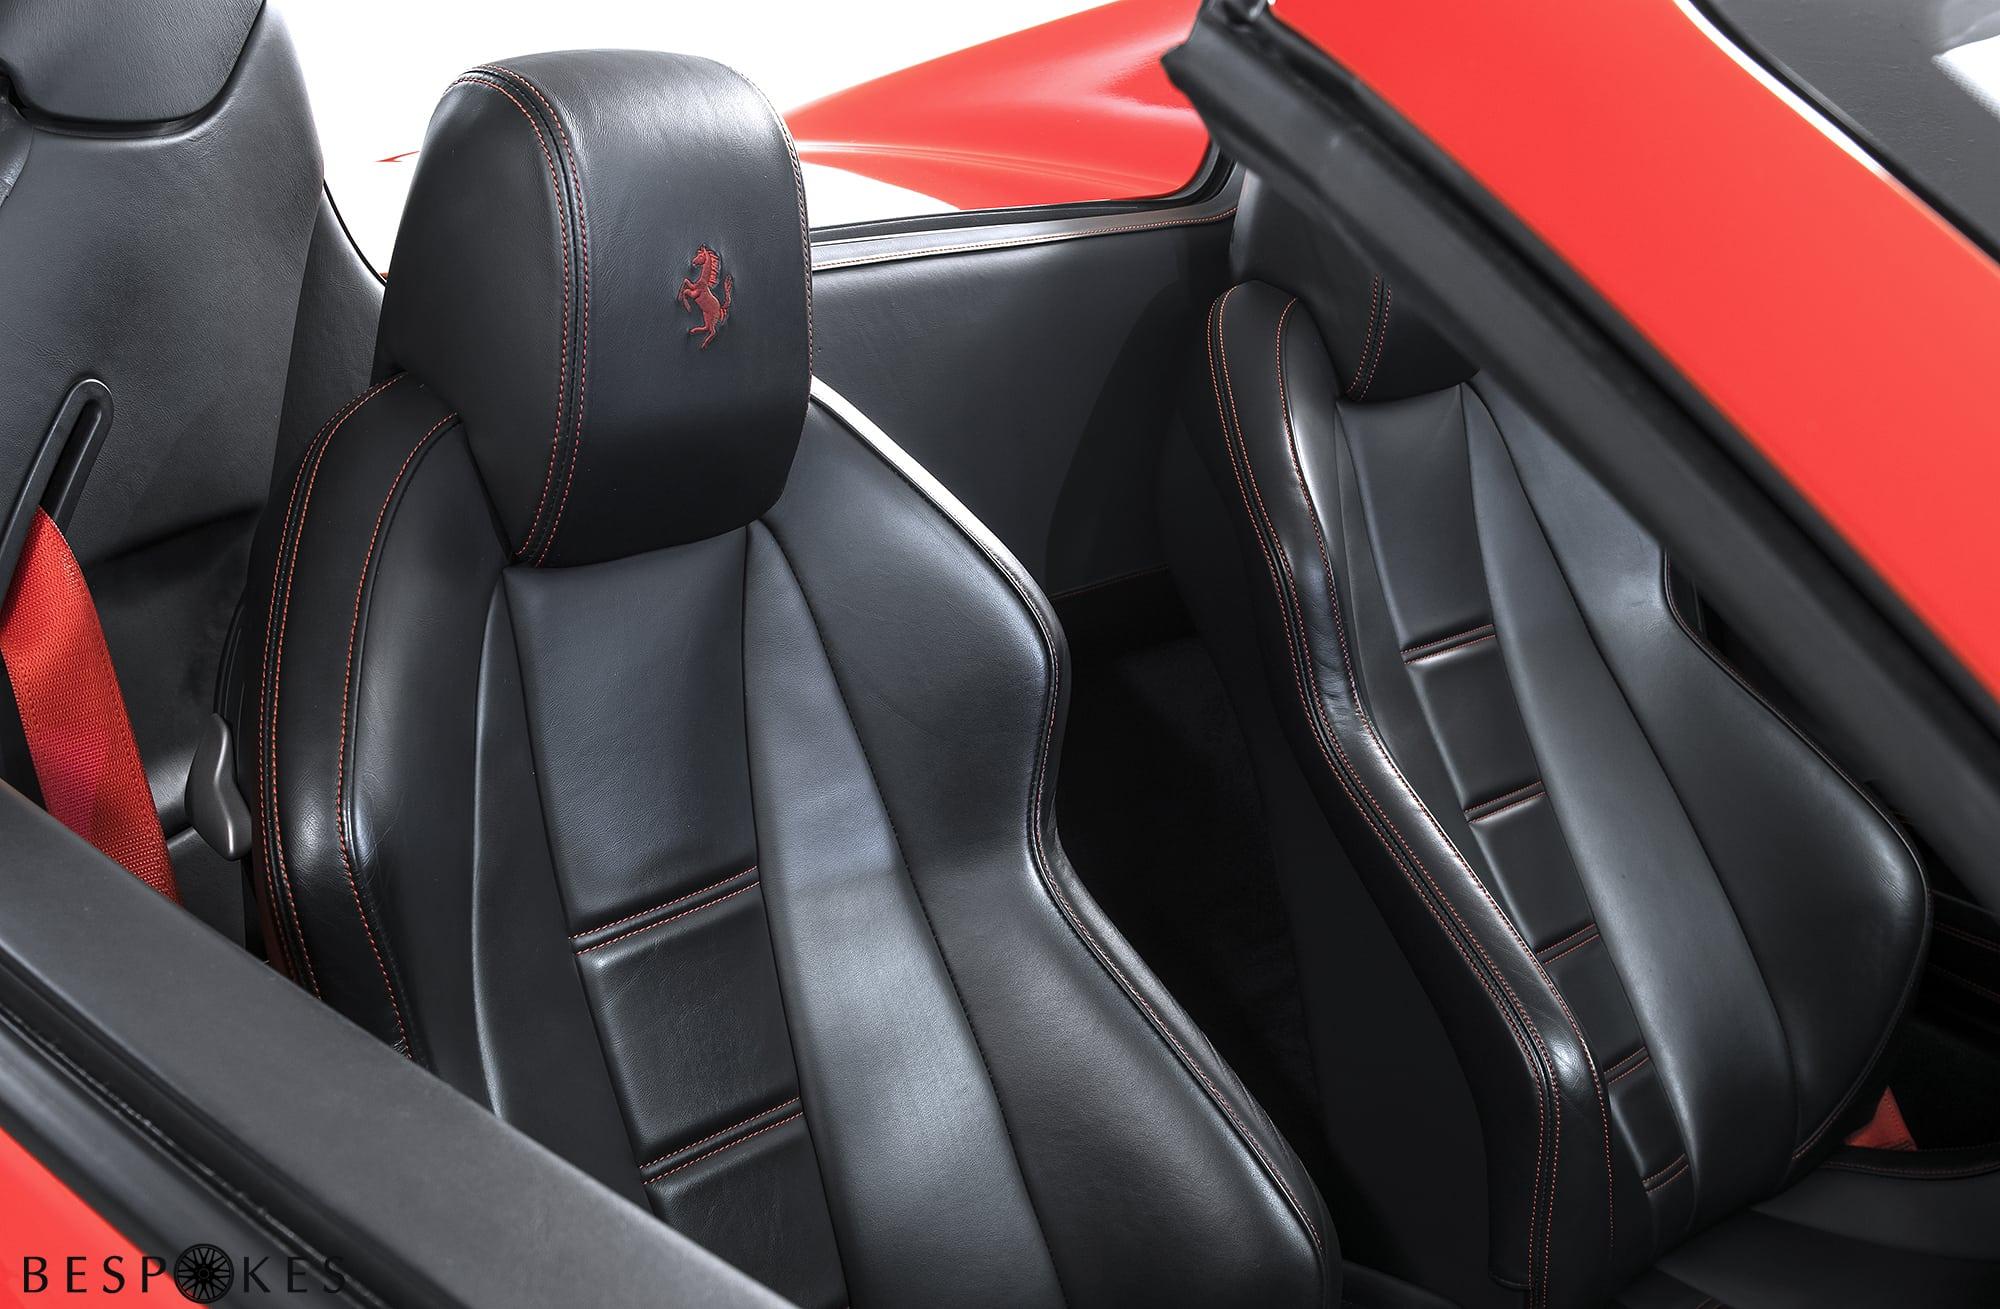 Ferrari 458 Spider Hire – Nationwide Delivery